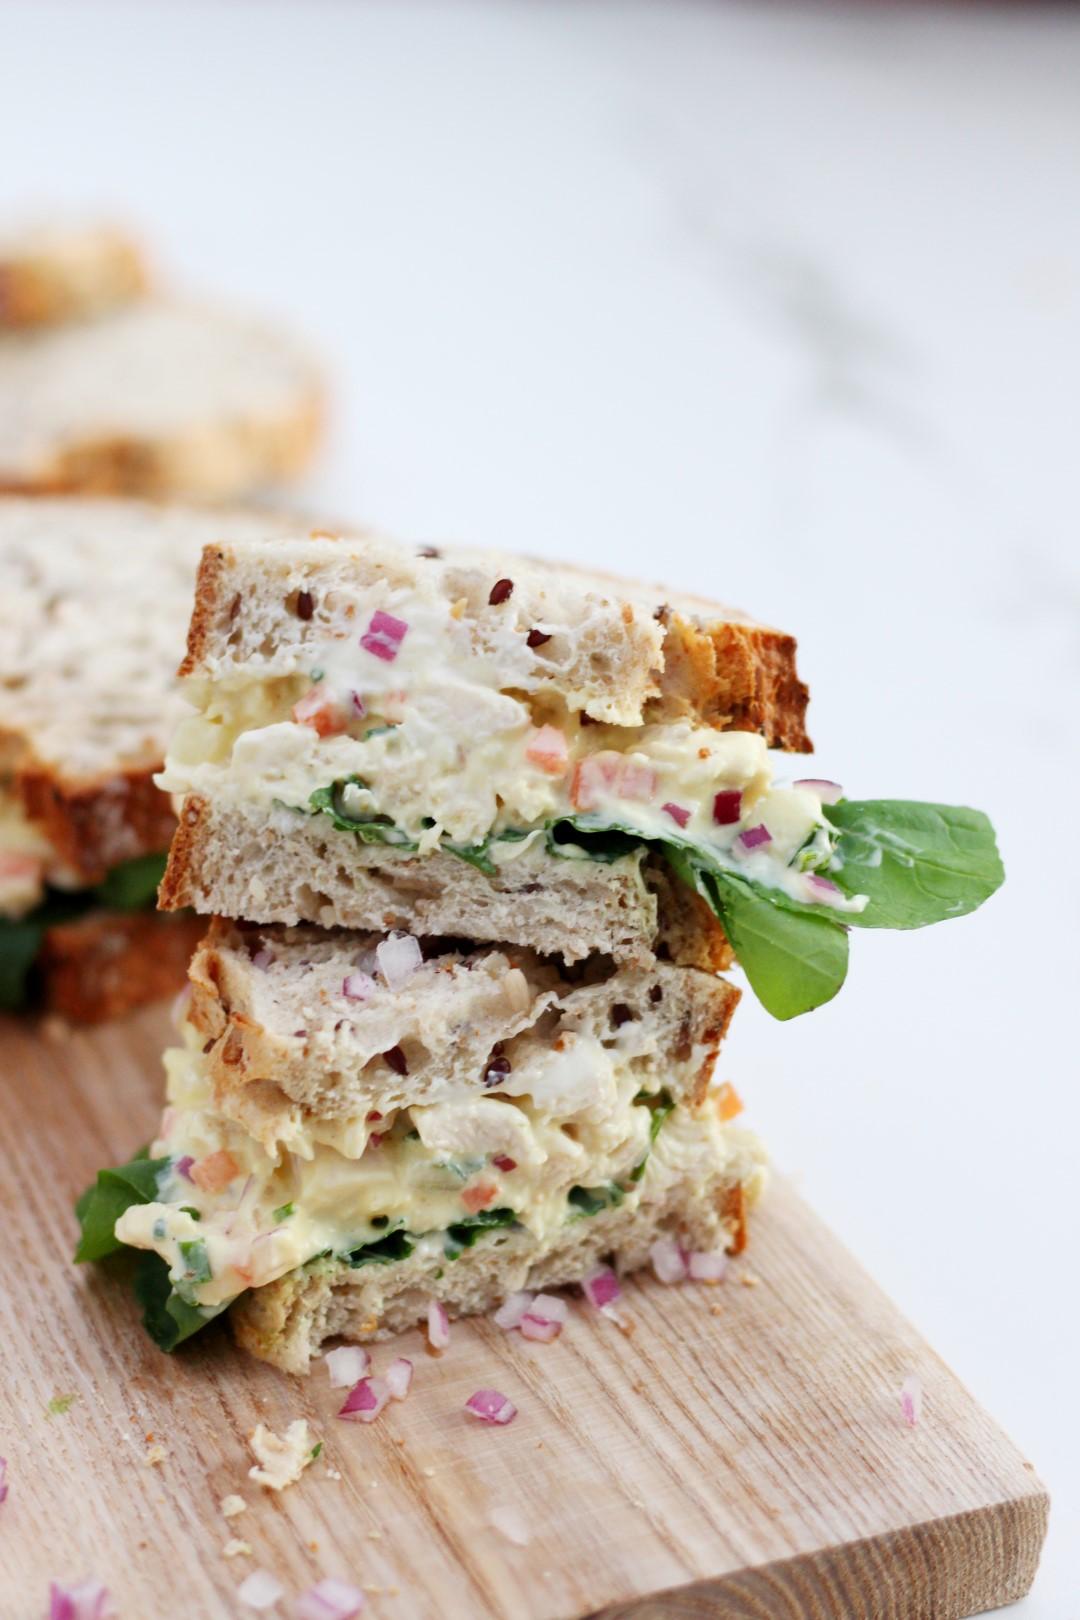 salad sandwich de pollo, emparedado de pollo, recetas de cocina, recetas de pollo, como cocinar pollo.